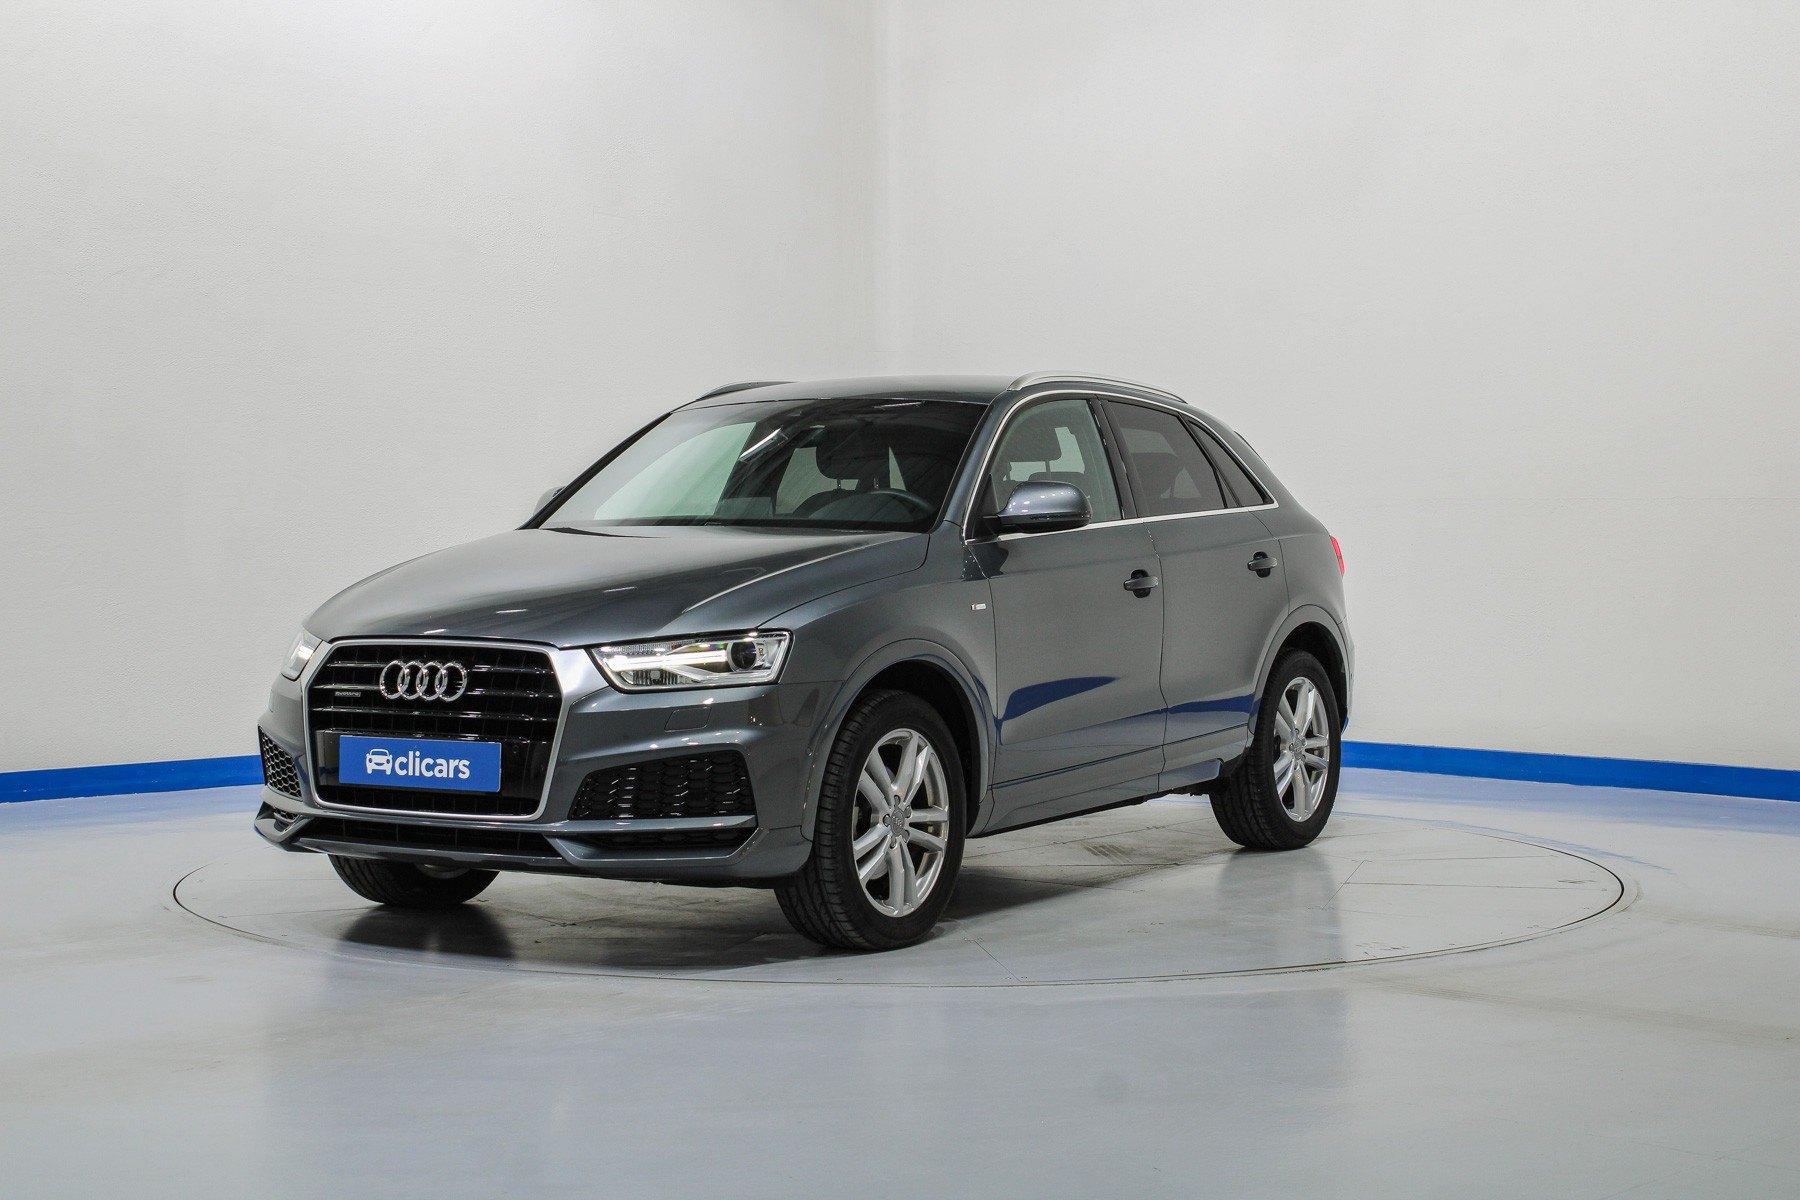 Audi Q3 Diésel 2.0 TDI 110kW (150CV) quattro 1